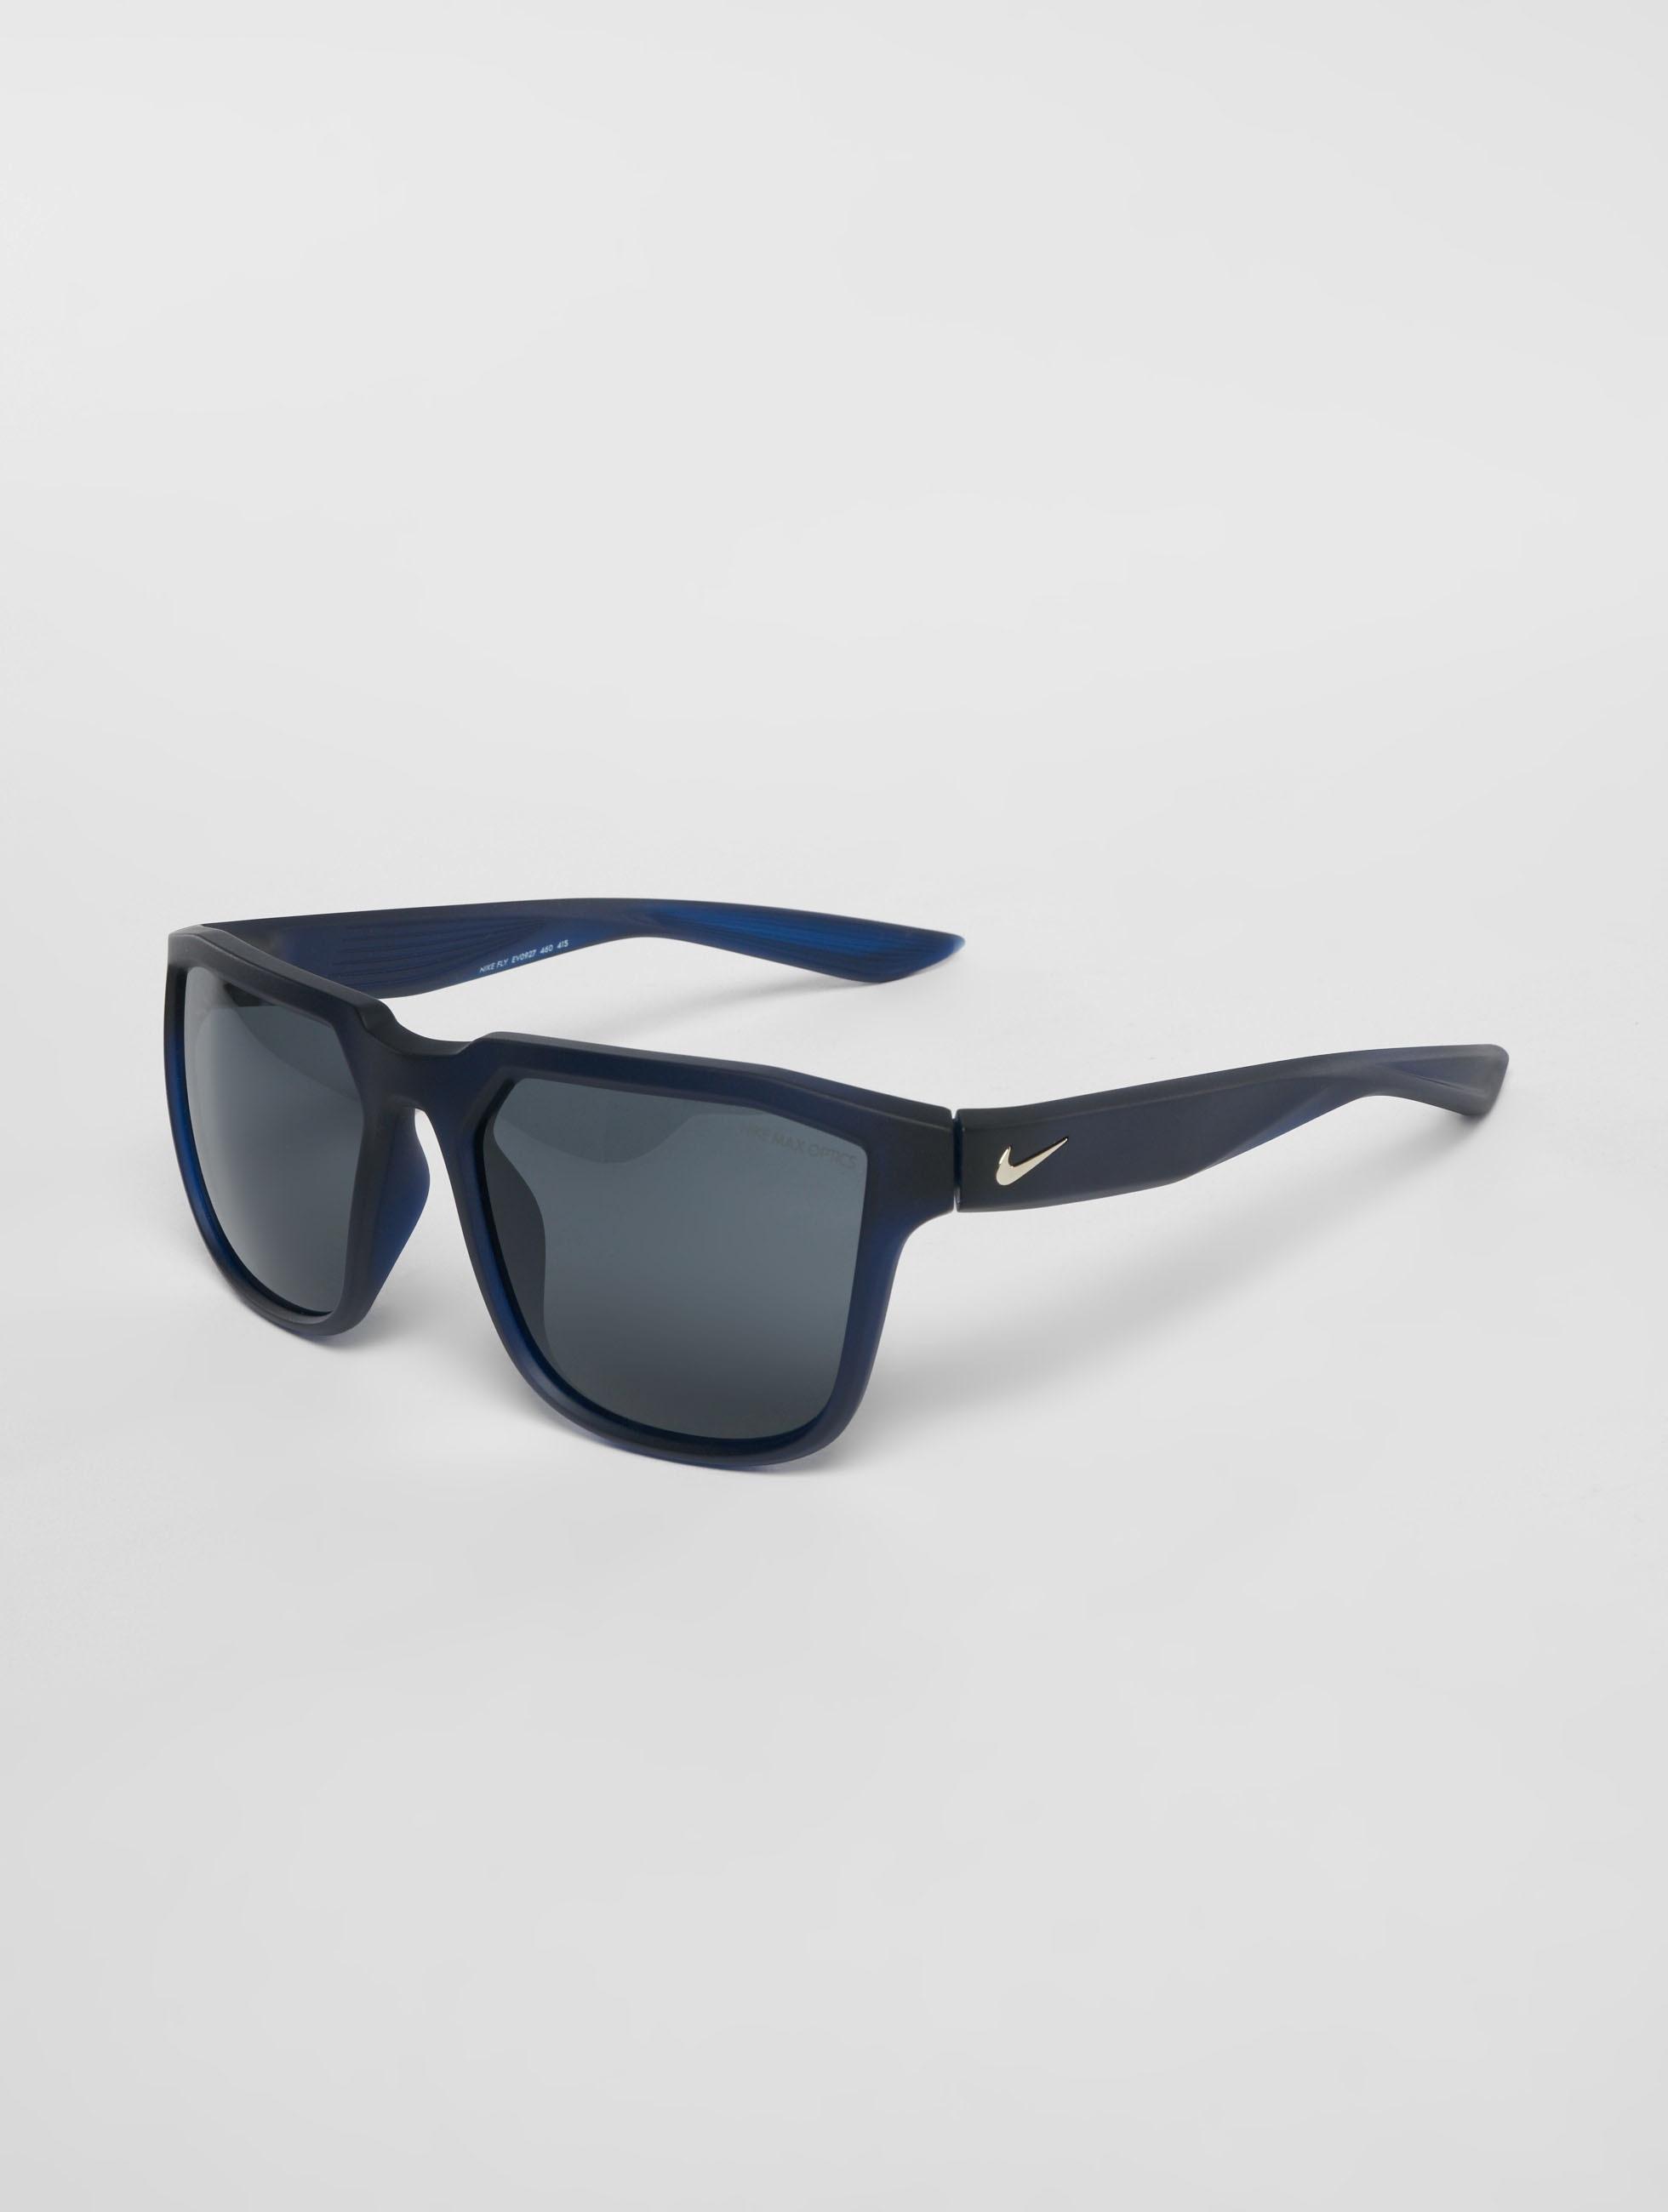 Nike Vision Lunettes de soleil Fly bleu